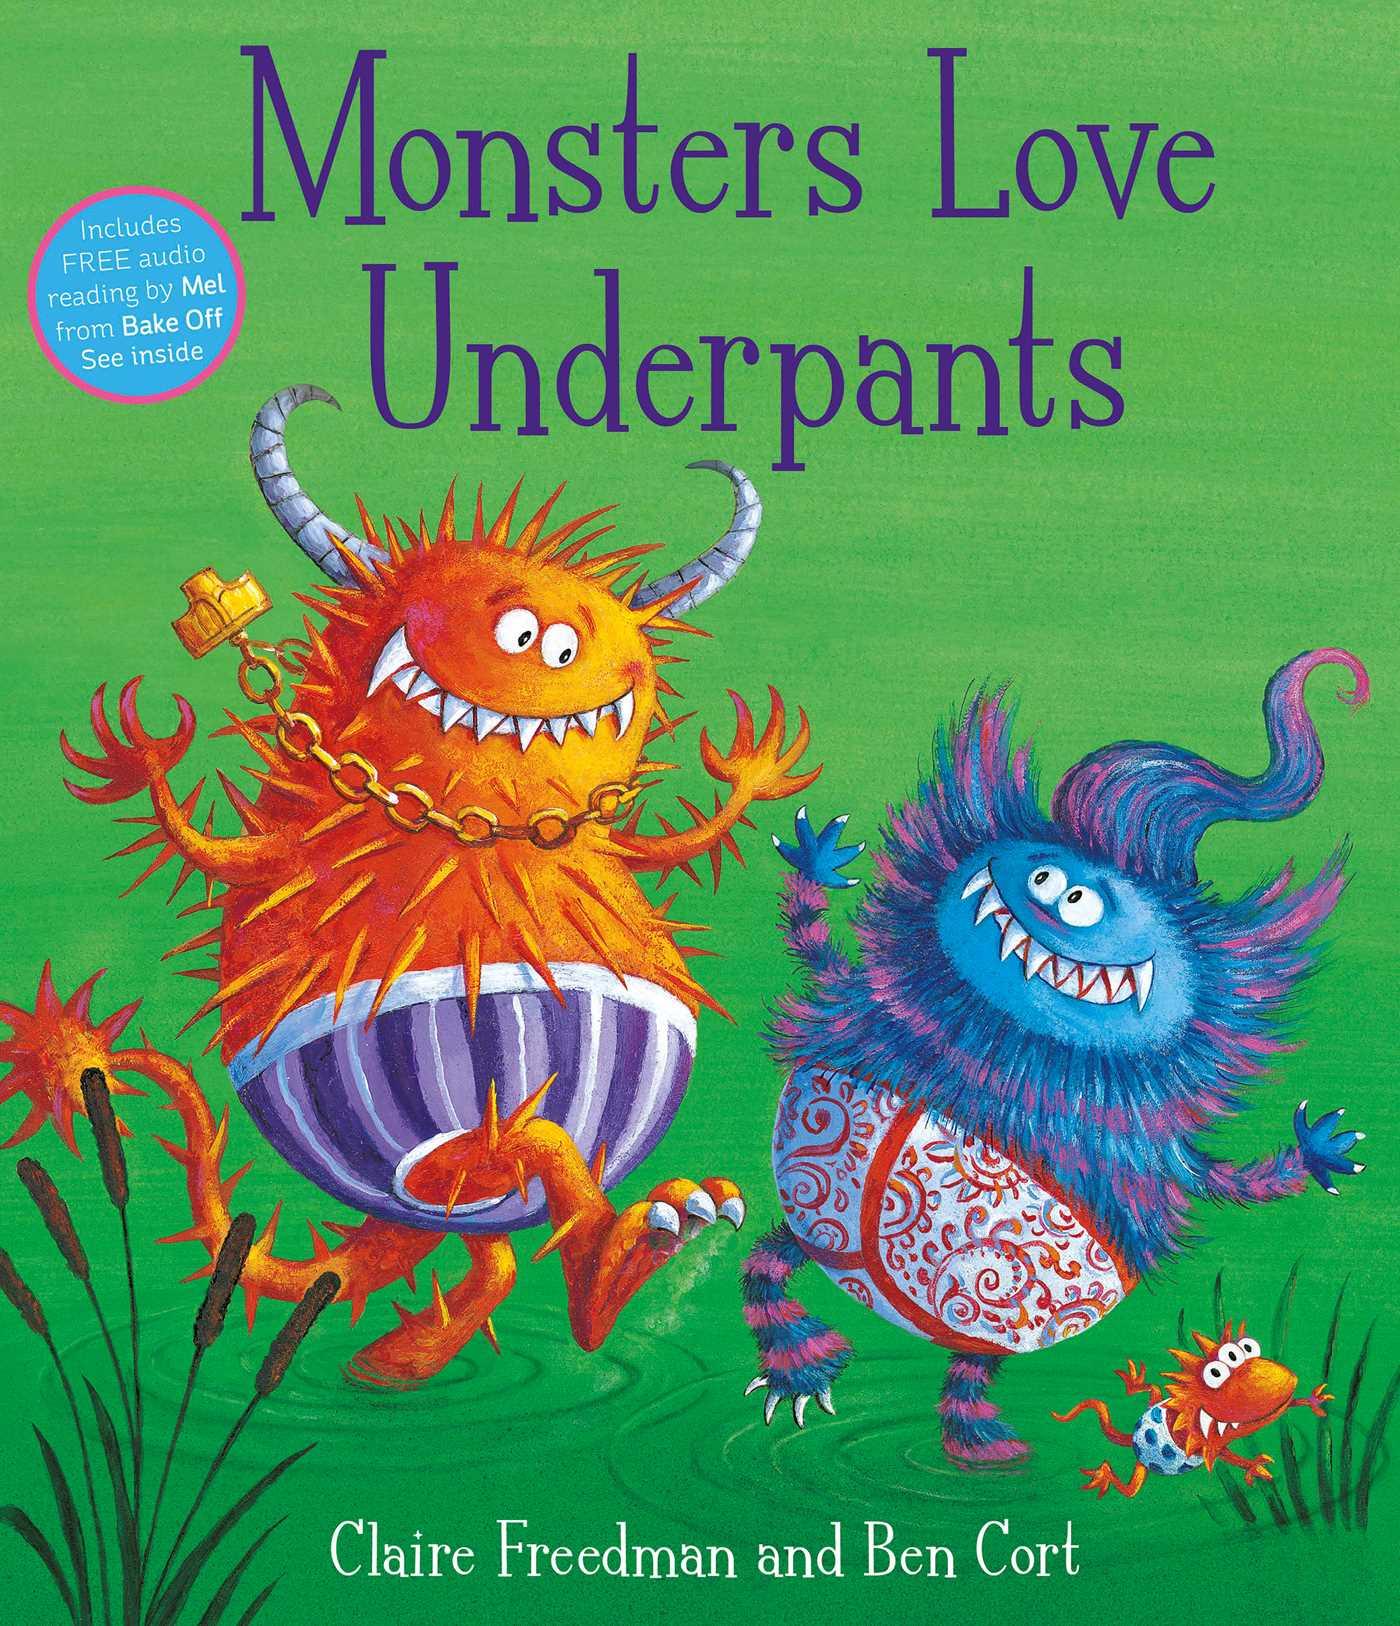 Monsters love underpants 9781847385727 hr